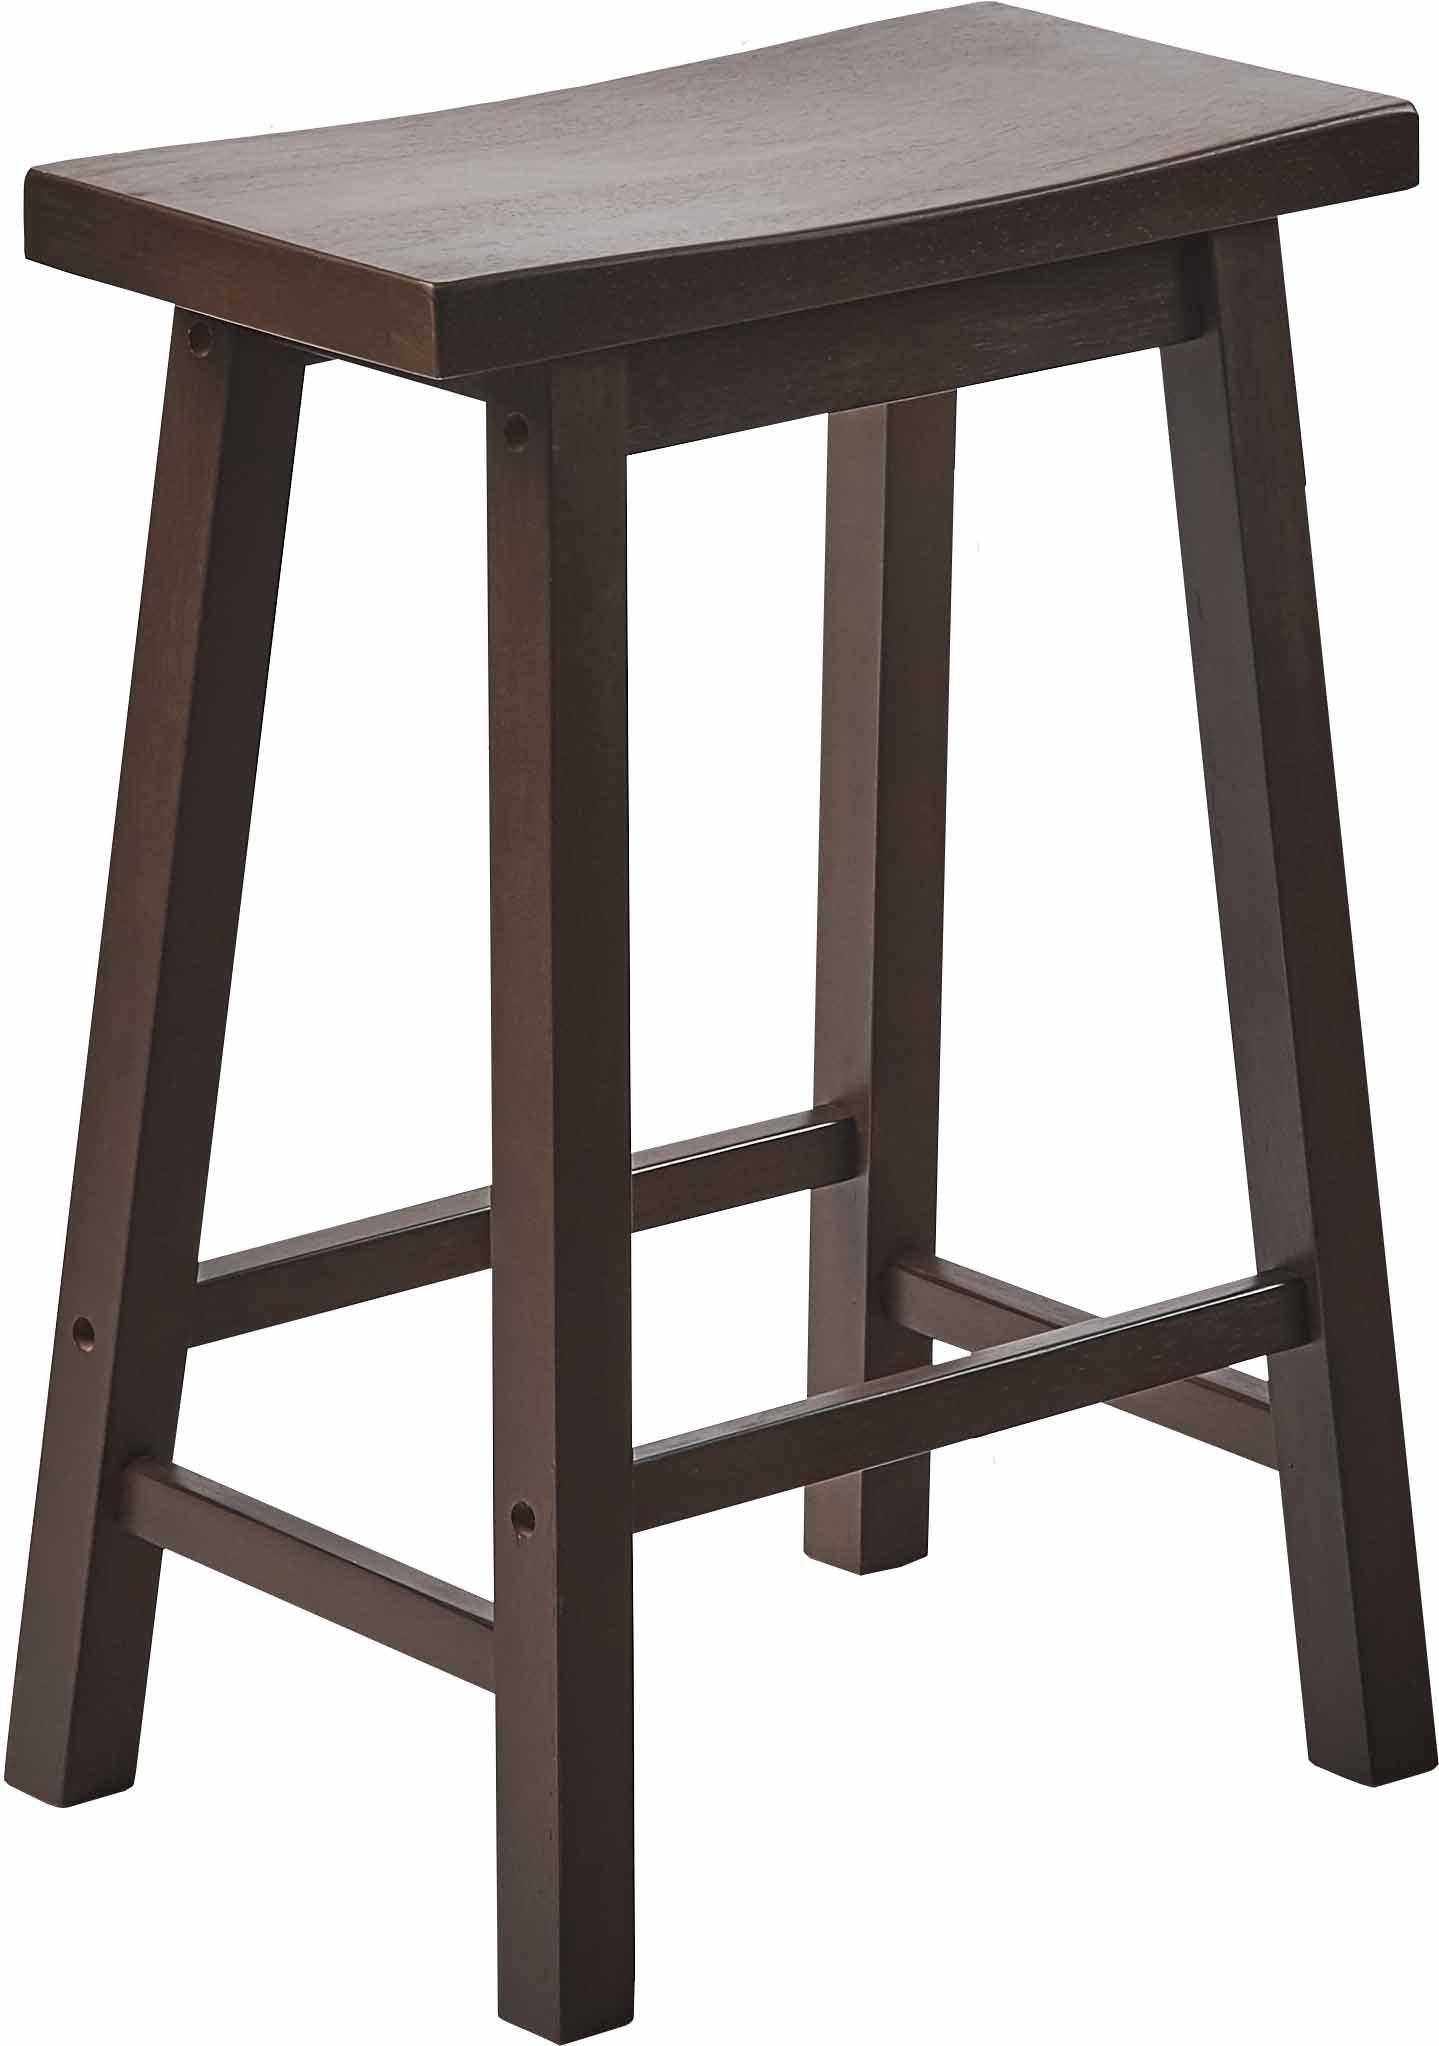 PJ Wood 24-Inch Saddle Seat Counter Stool - Walnut Finish Rubberwood